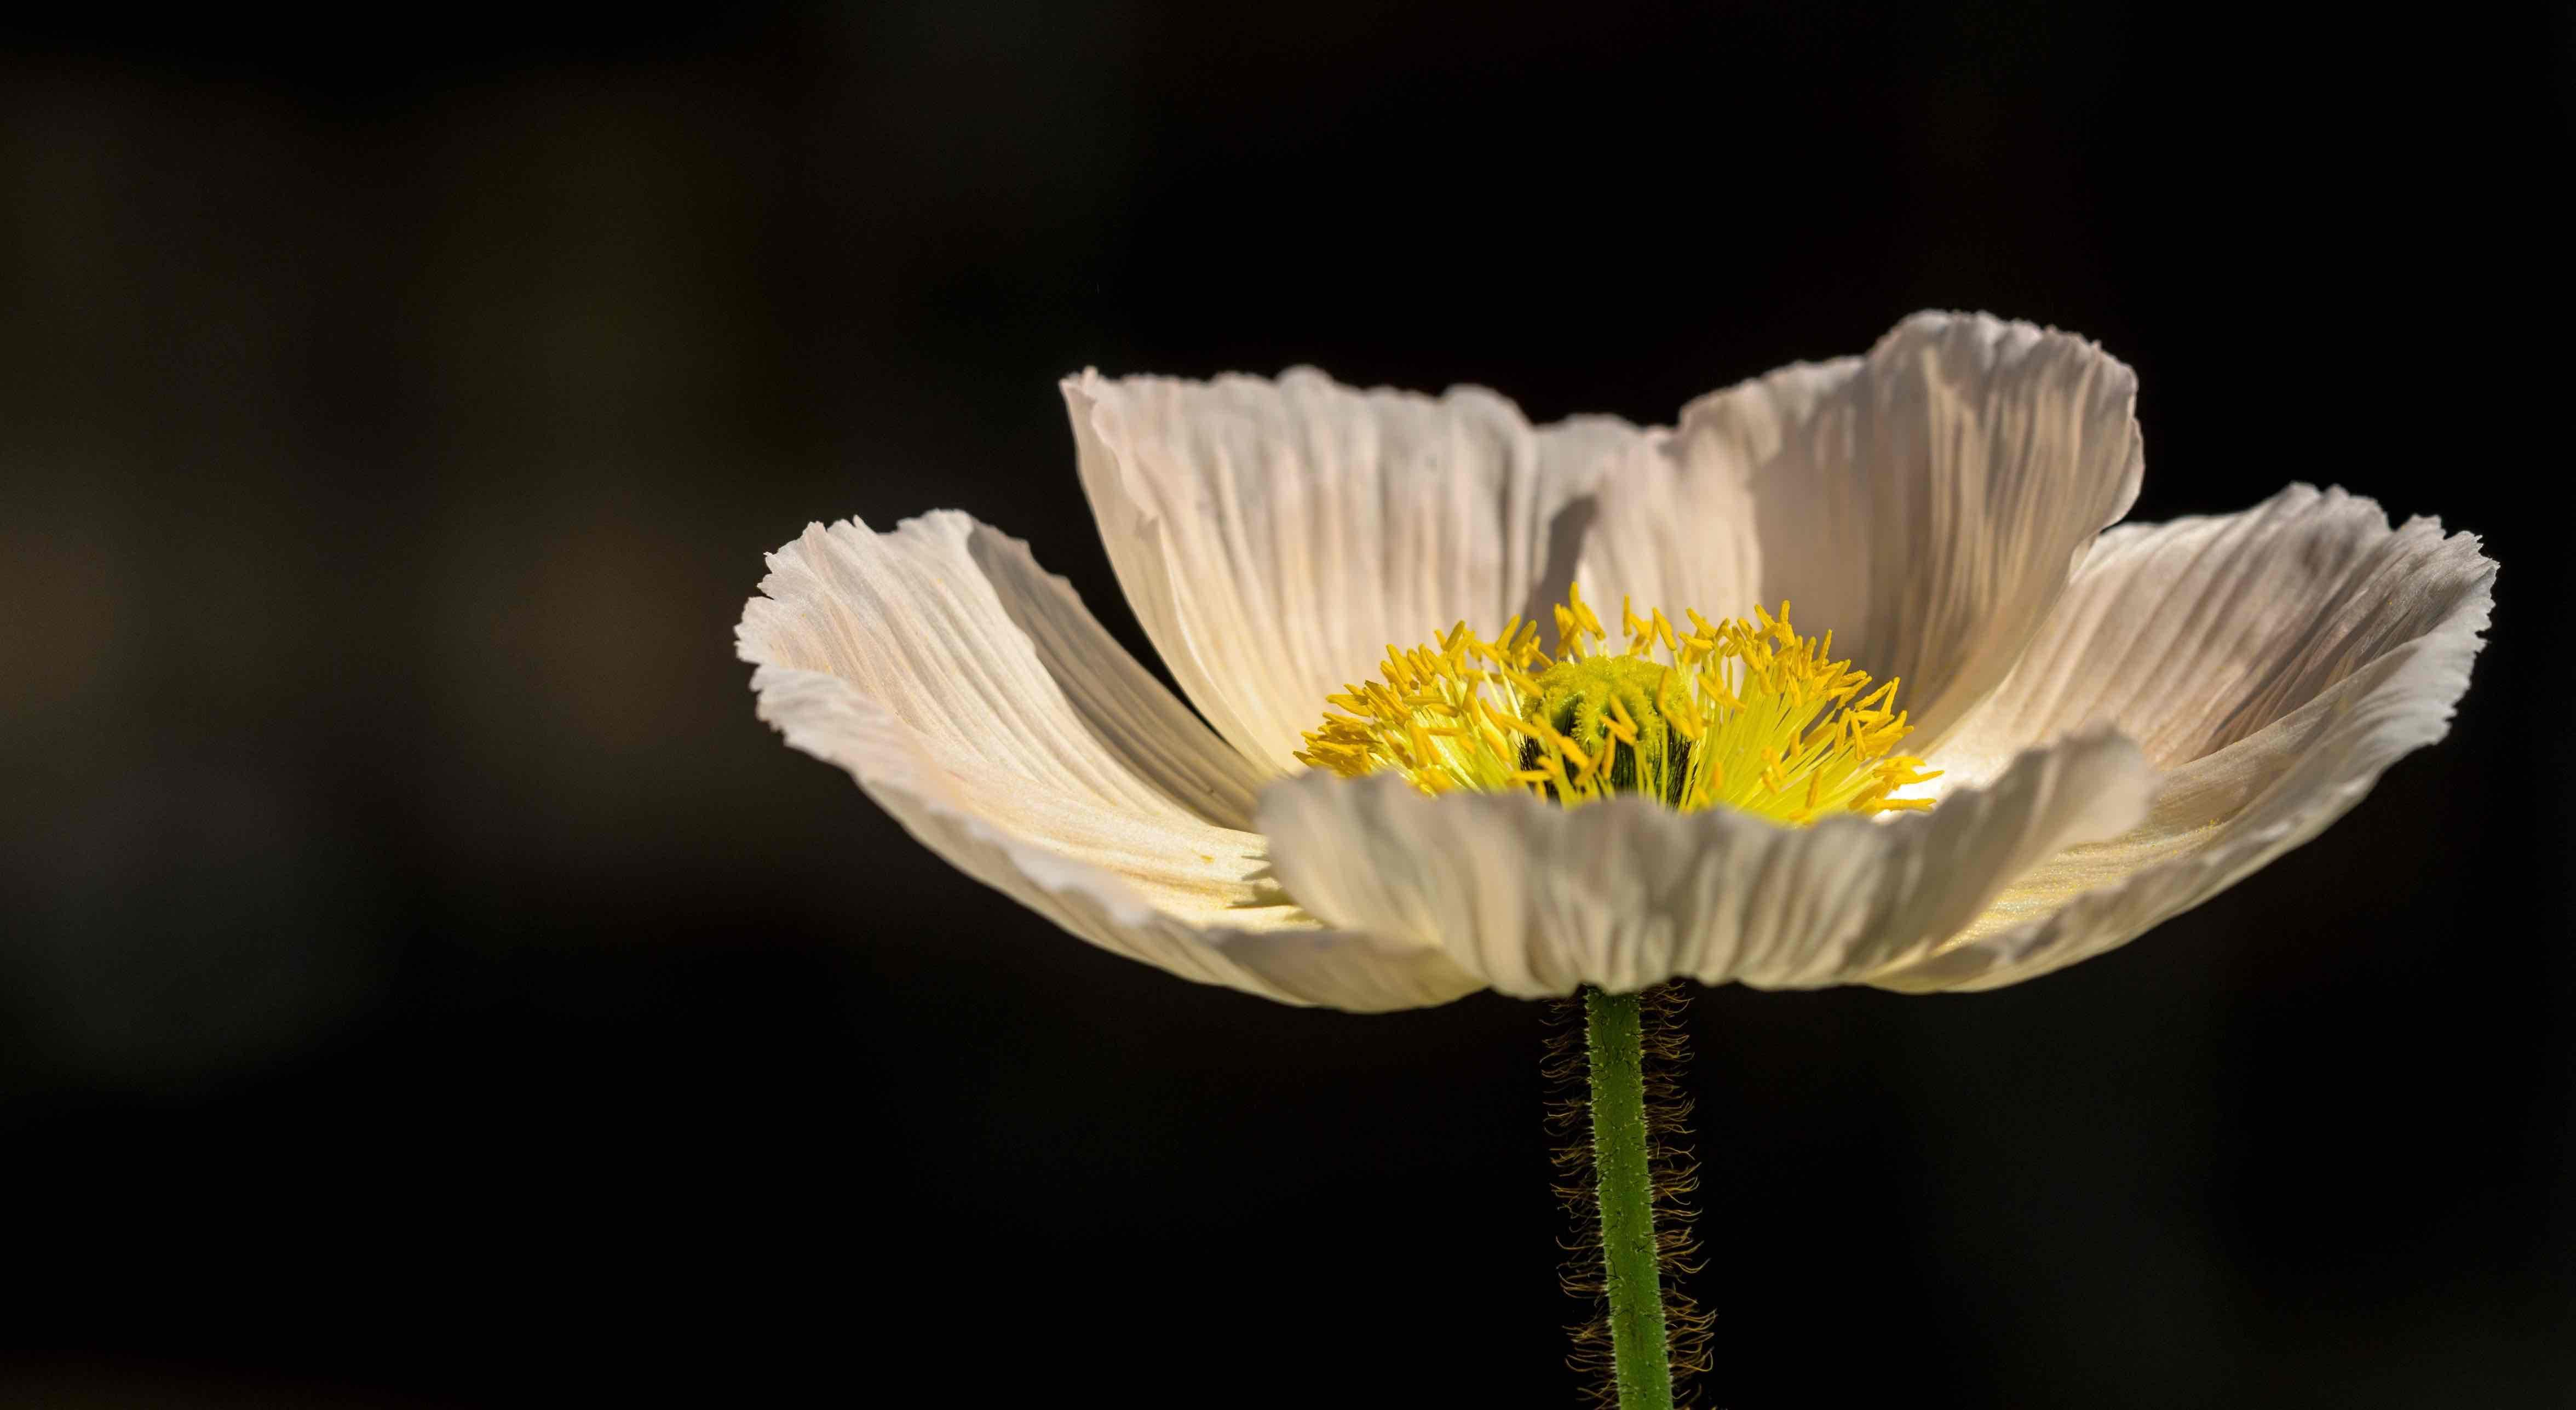 Imagenes muy lindas de flores3